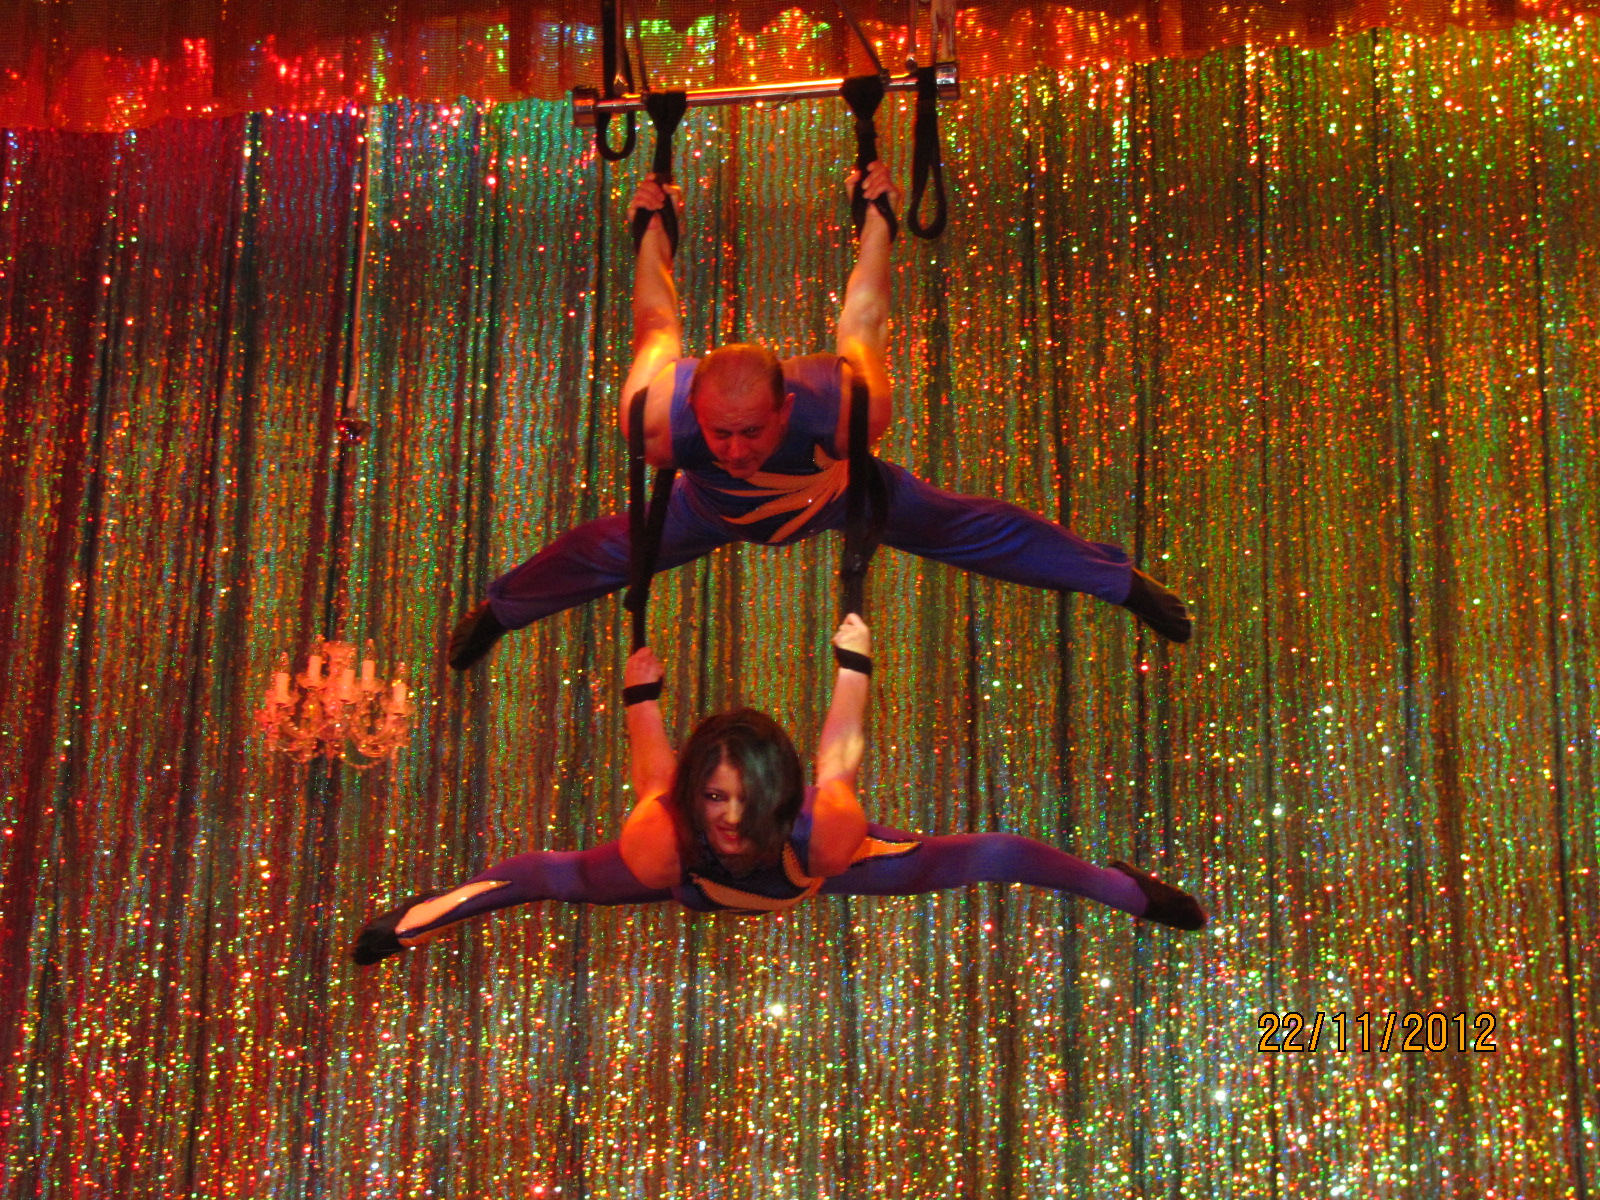 duo-dinica-acrobatie-aeriana-trapez-show-artisti-circ